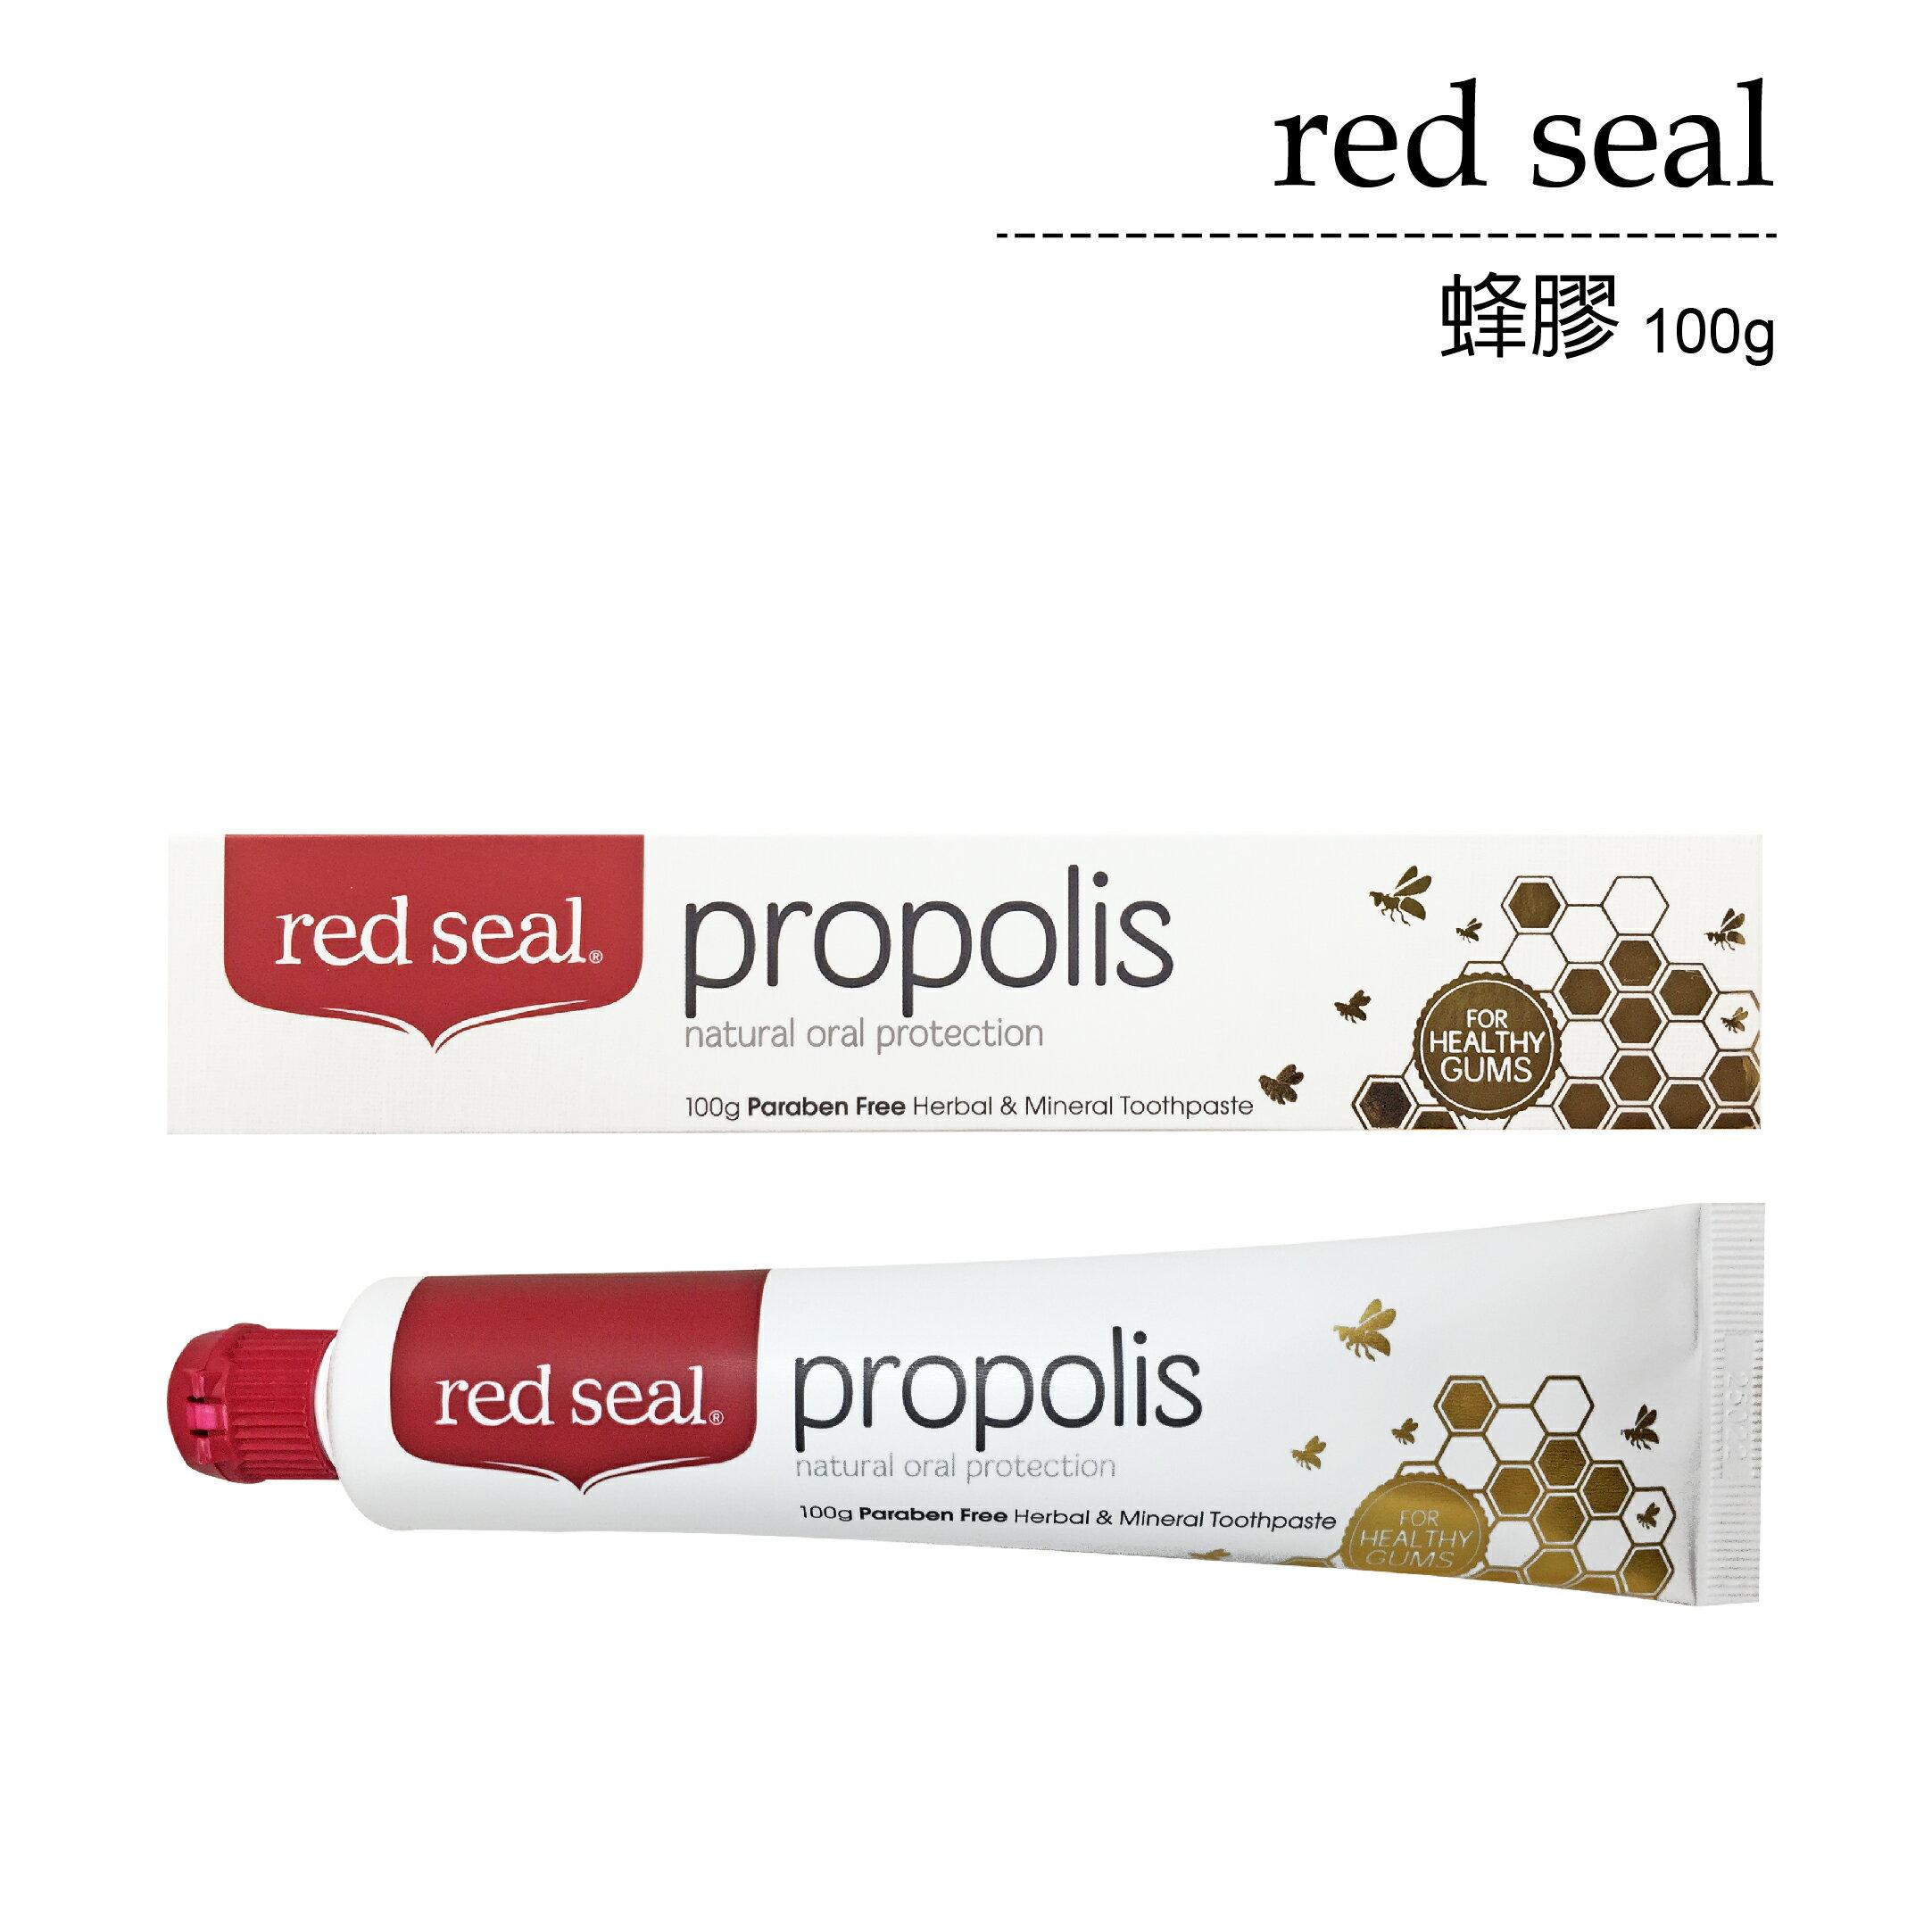 紐西蘭Red Seal 蜂膠牙膏 100g